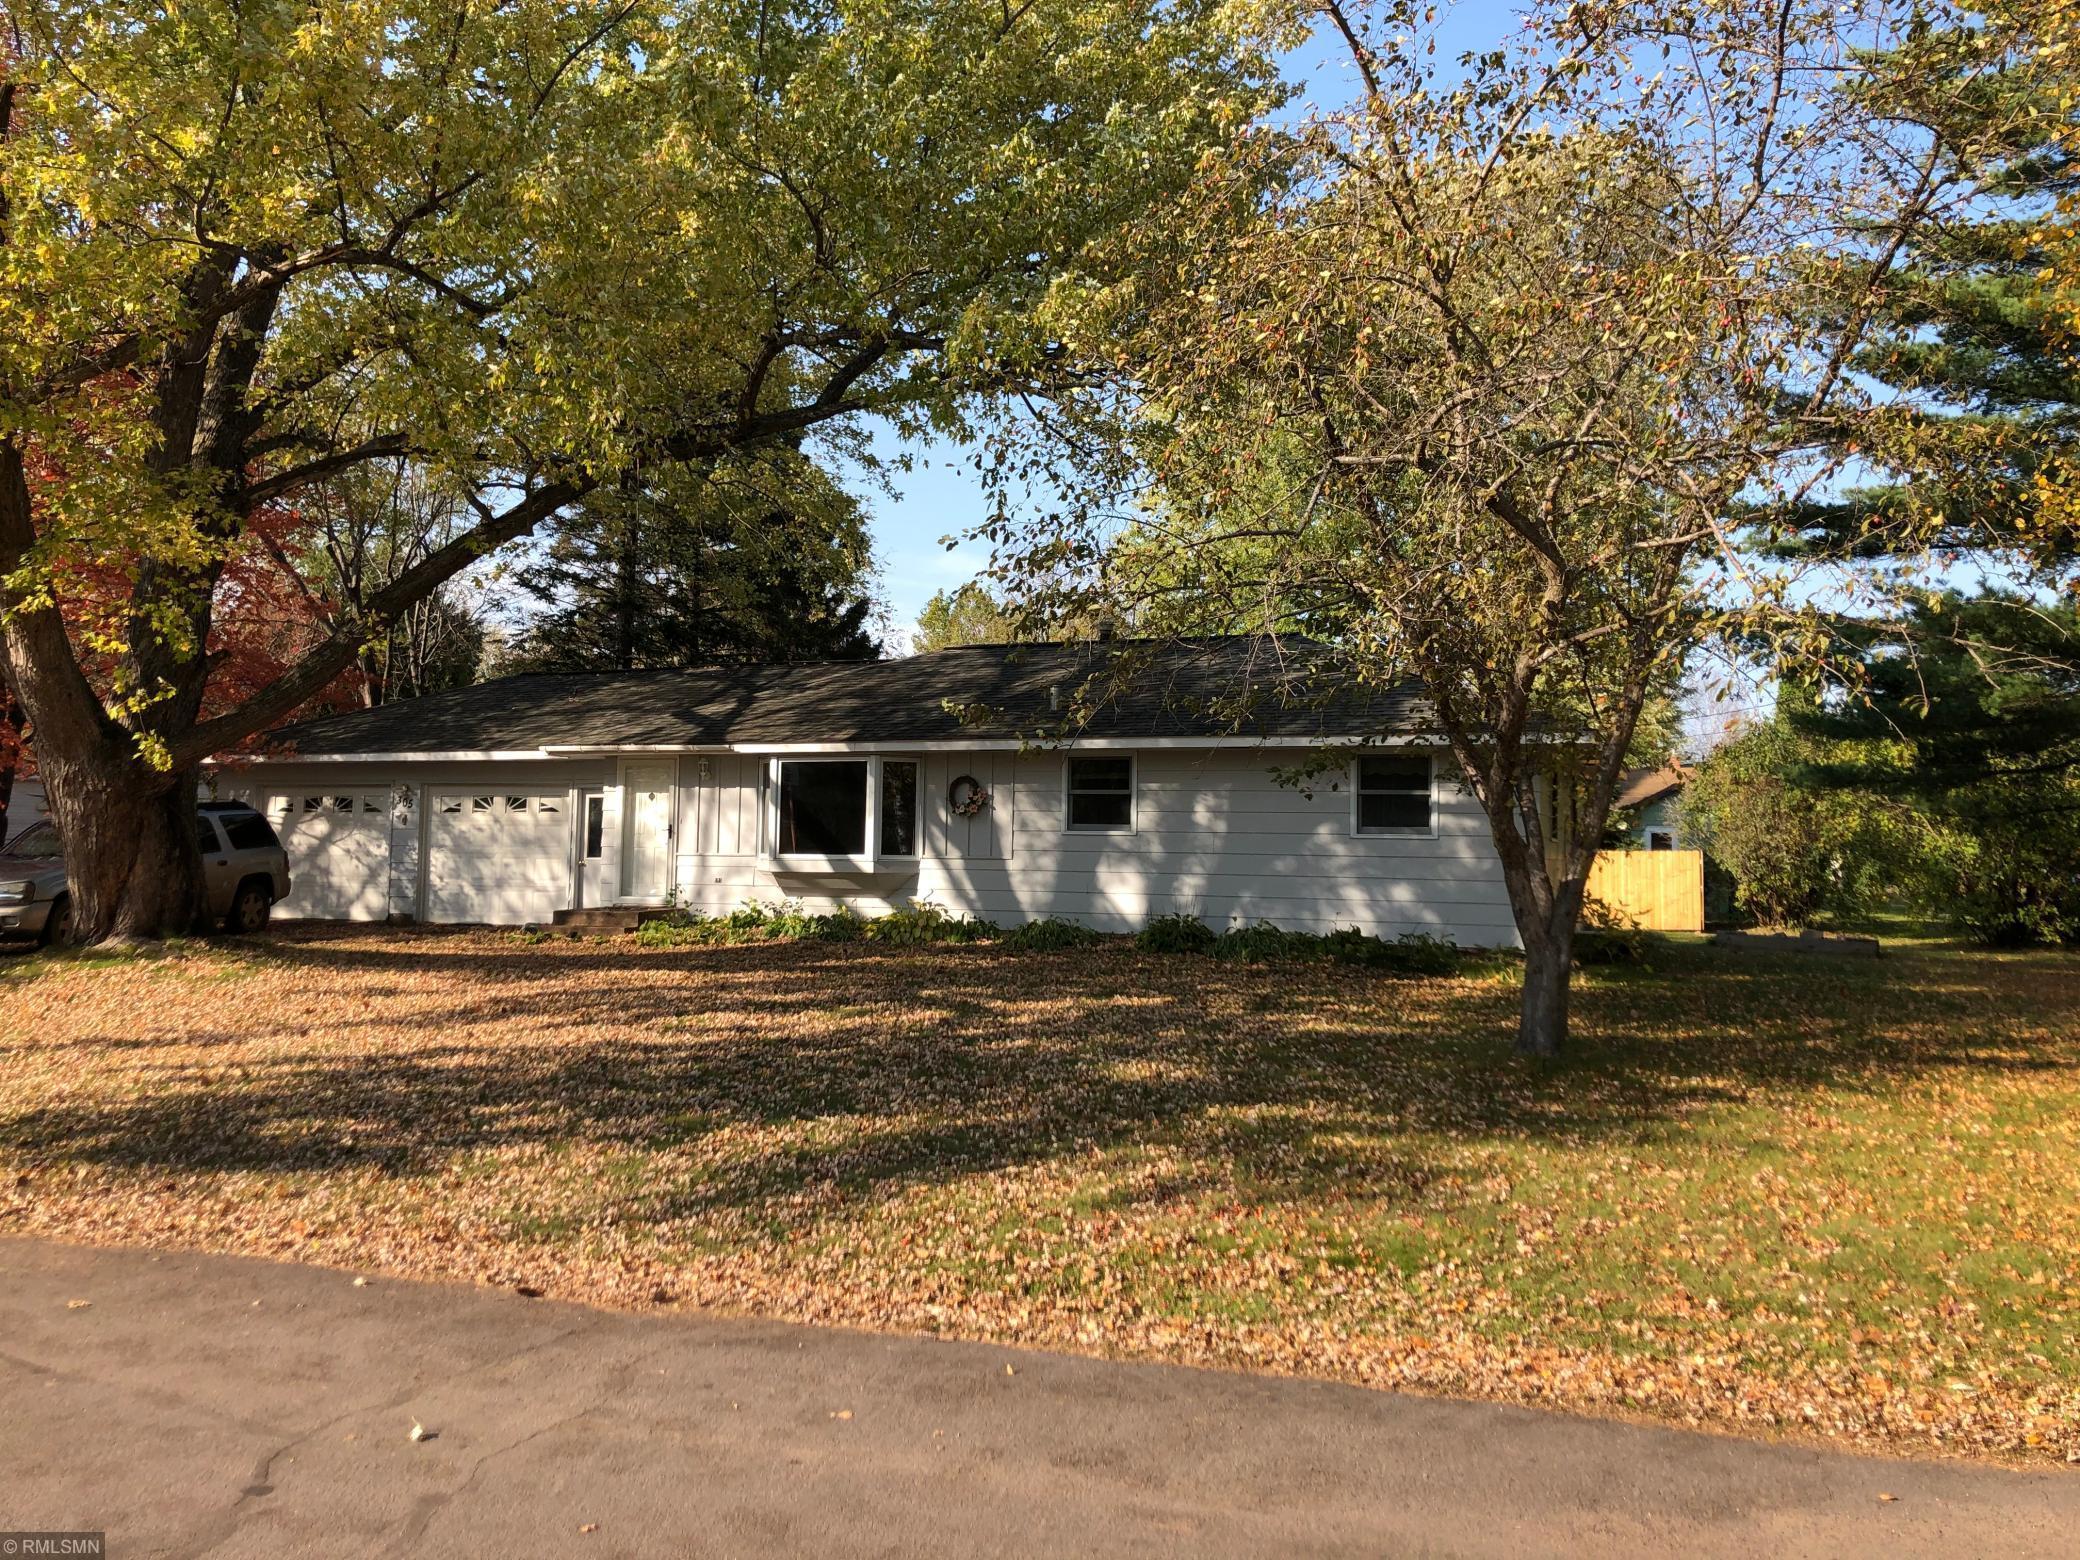 305 3rd Street SE Property Photo - Hinckley, MN real estate listing